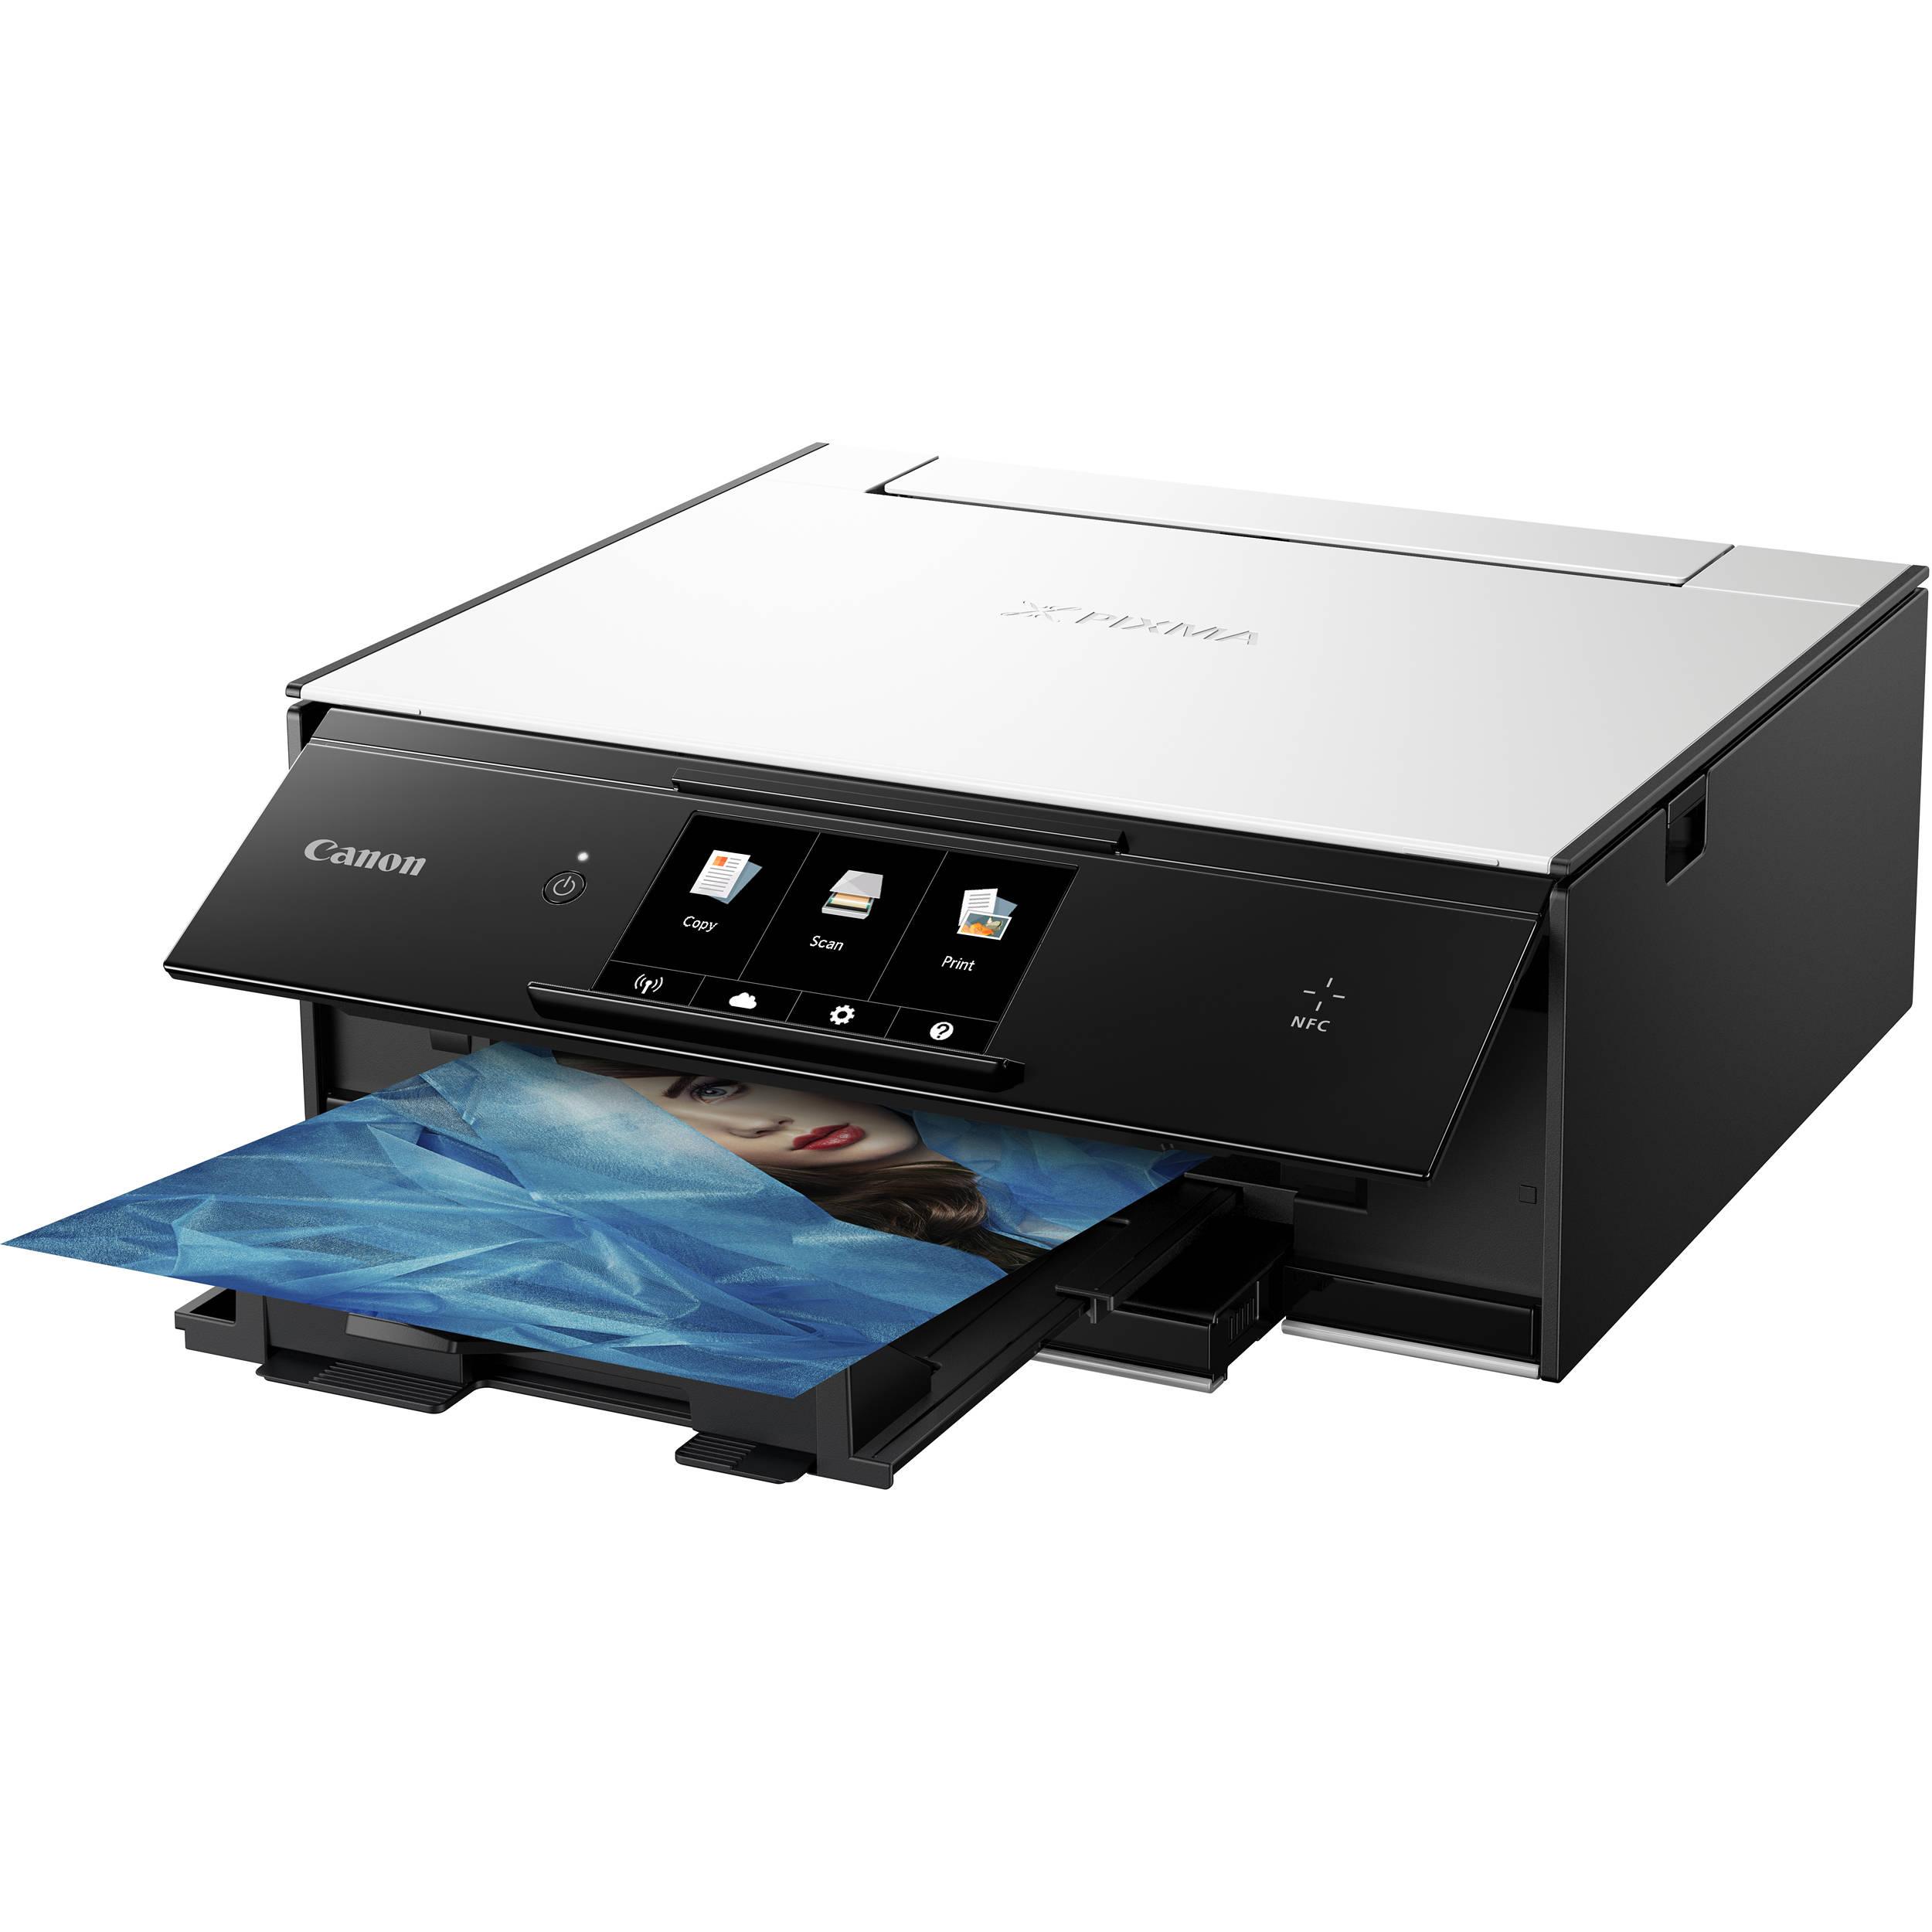 hp officejet 4650 printer manual